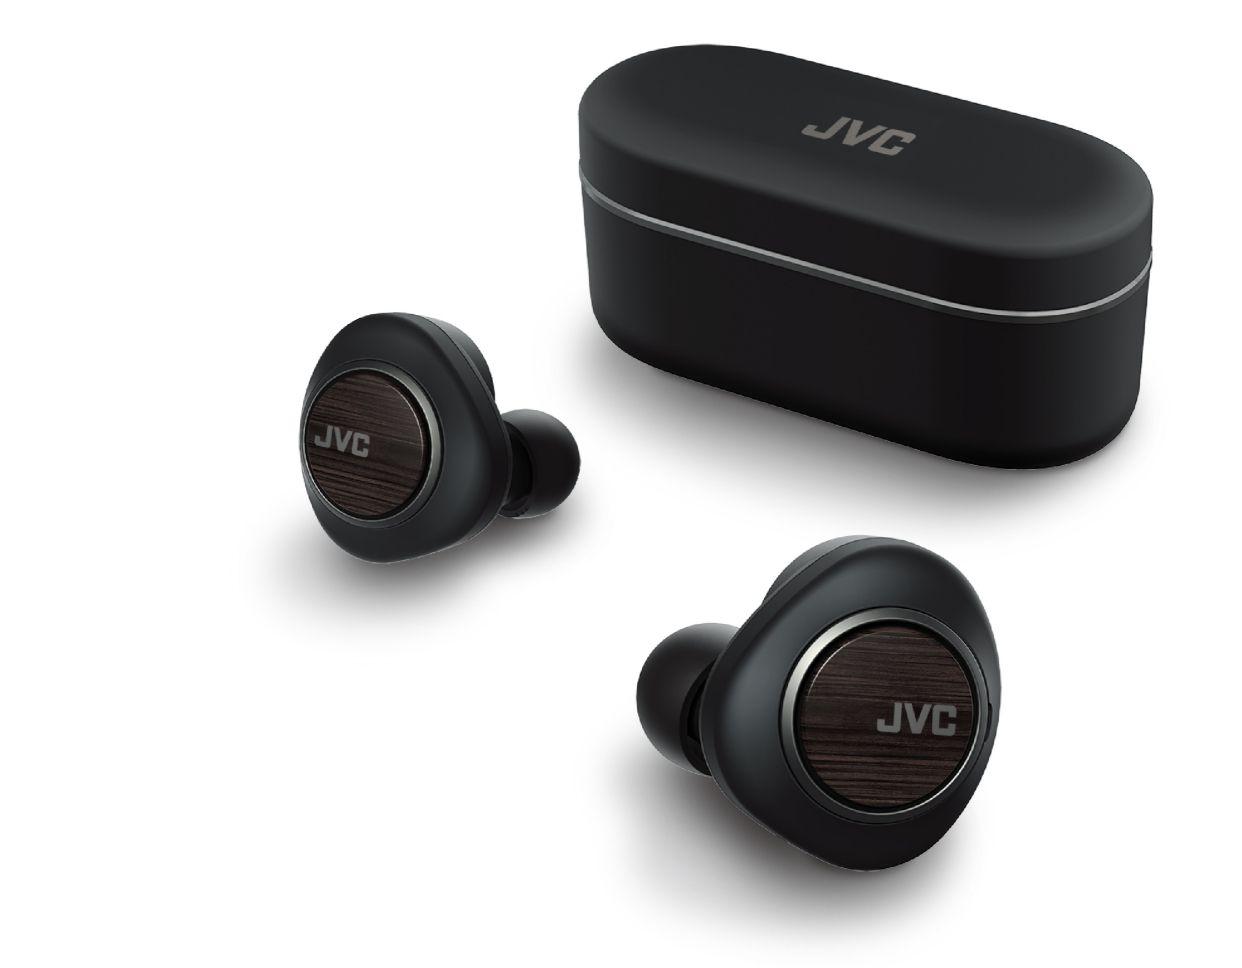 JVC即将发售採用木振膜技术真无线耳机产品FW1000T